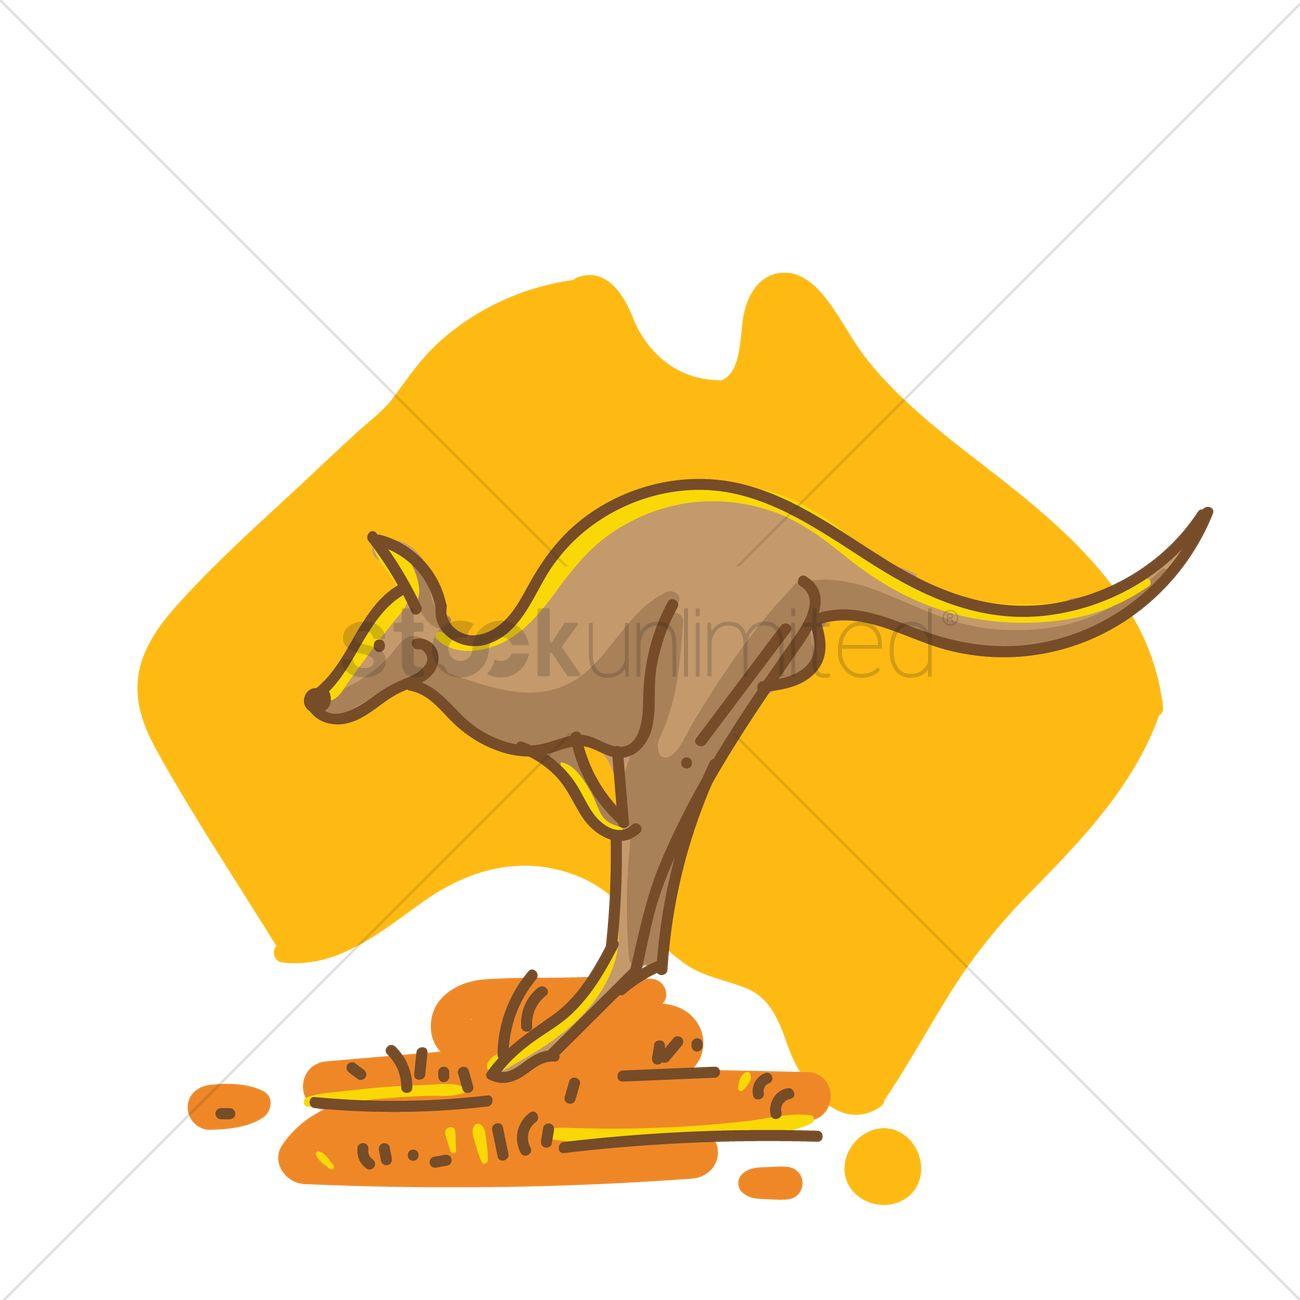 Kangaroo On Australia Map Vector Image StockUnlimited - Australia map kangaroo